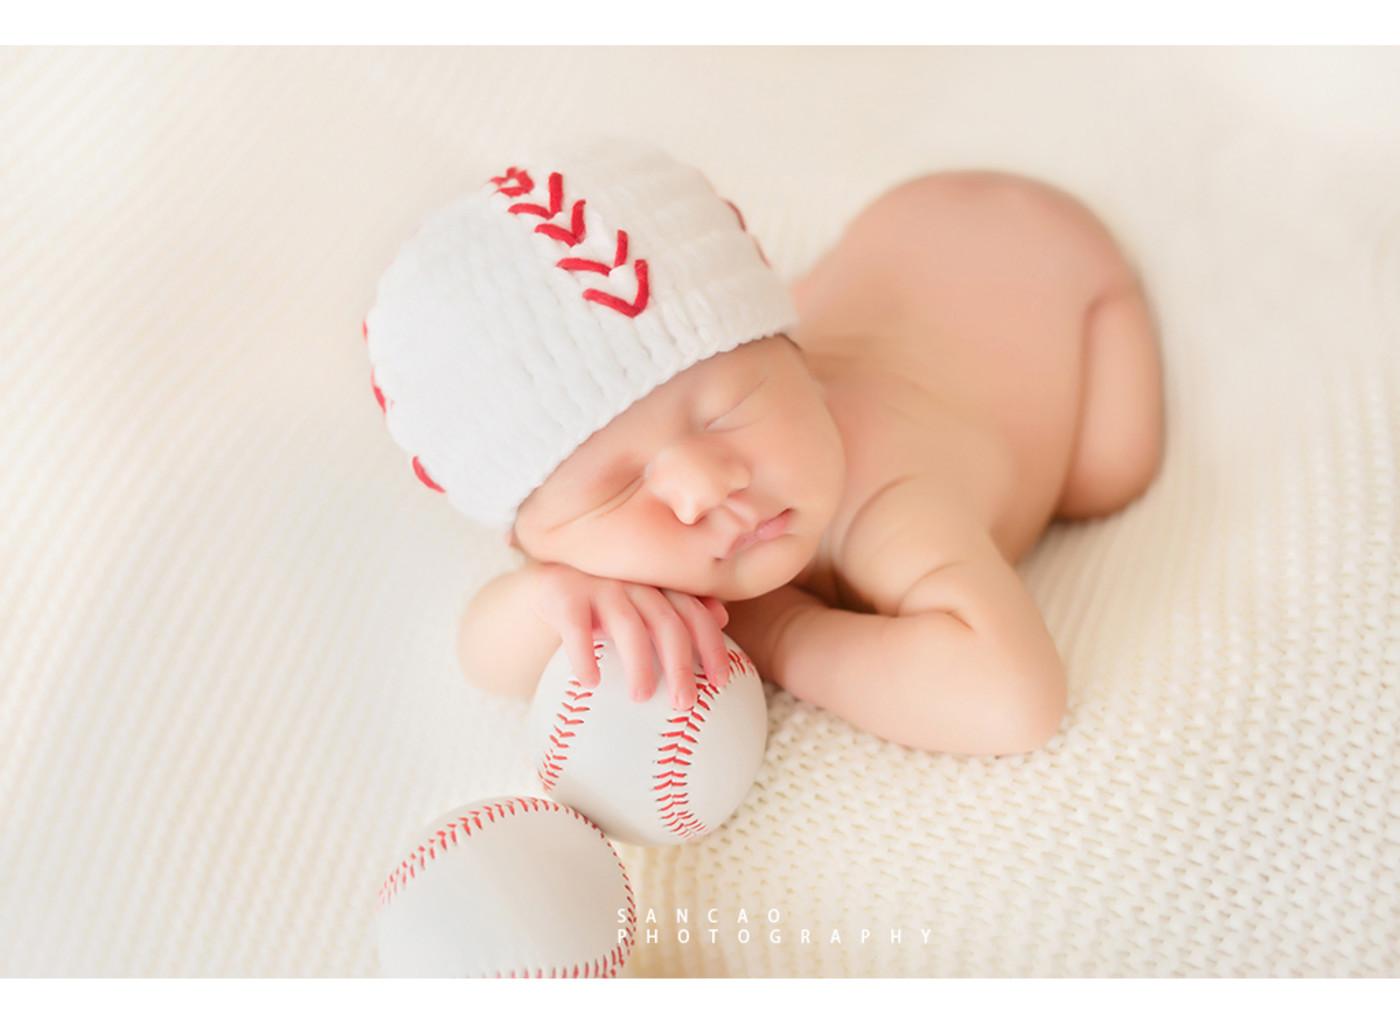 婴儿(0-6个月)15